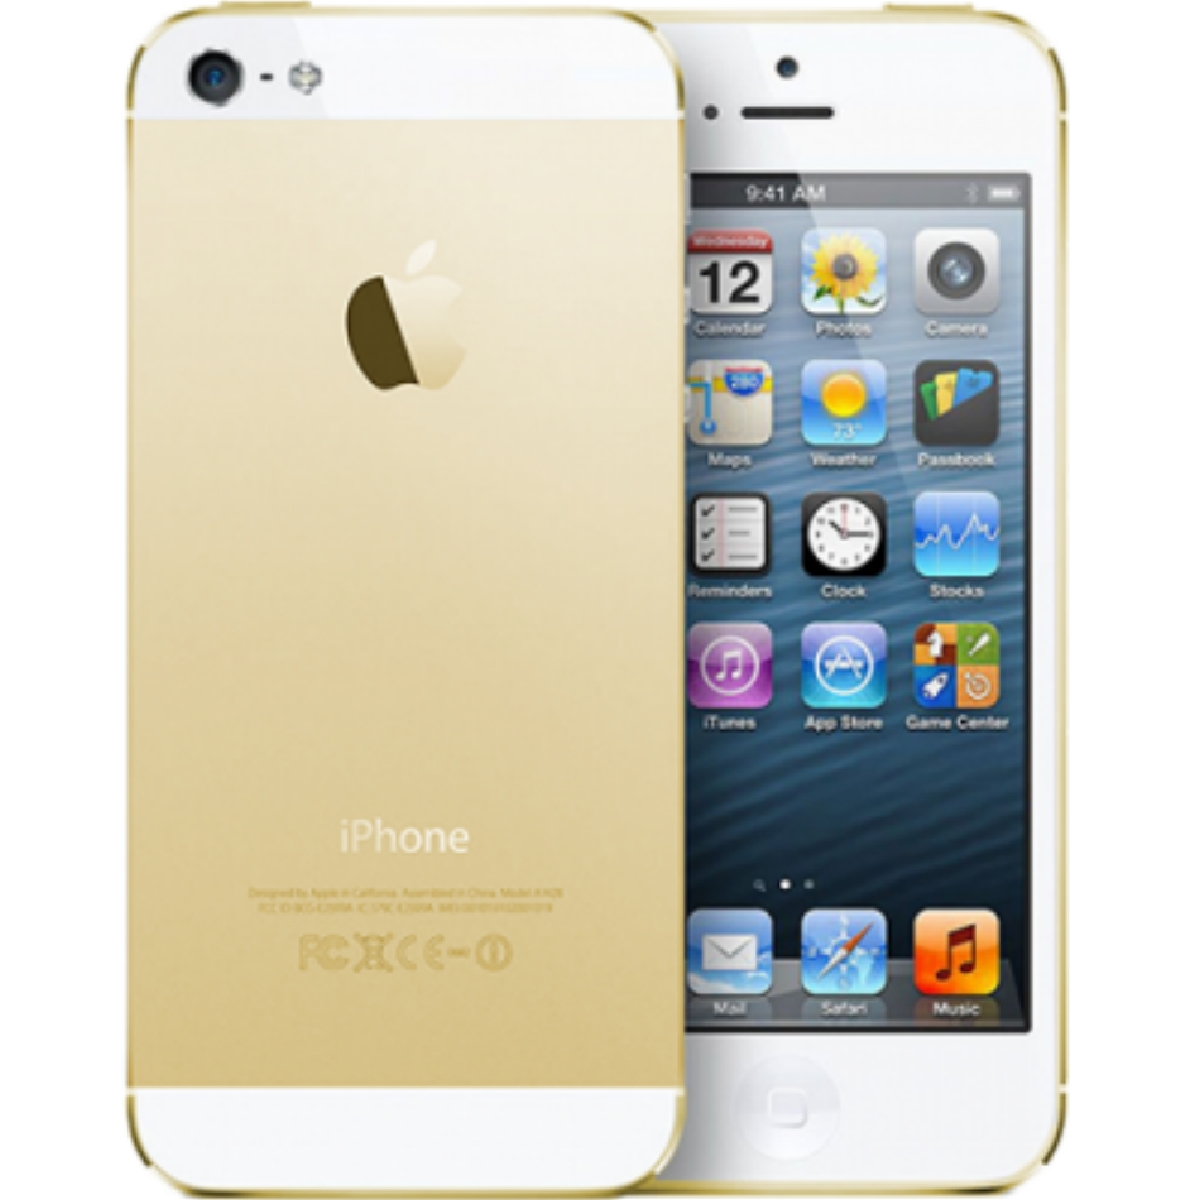 Apple-iPhone-5s-Unlocked-GSM-Unlocked-AT-amp-T-Verizon-T-Mobile-A1533 thumbnail 10